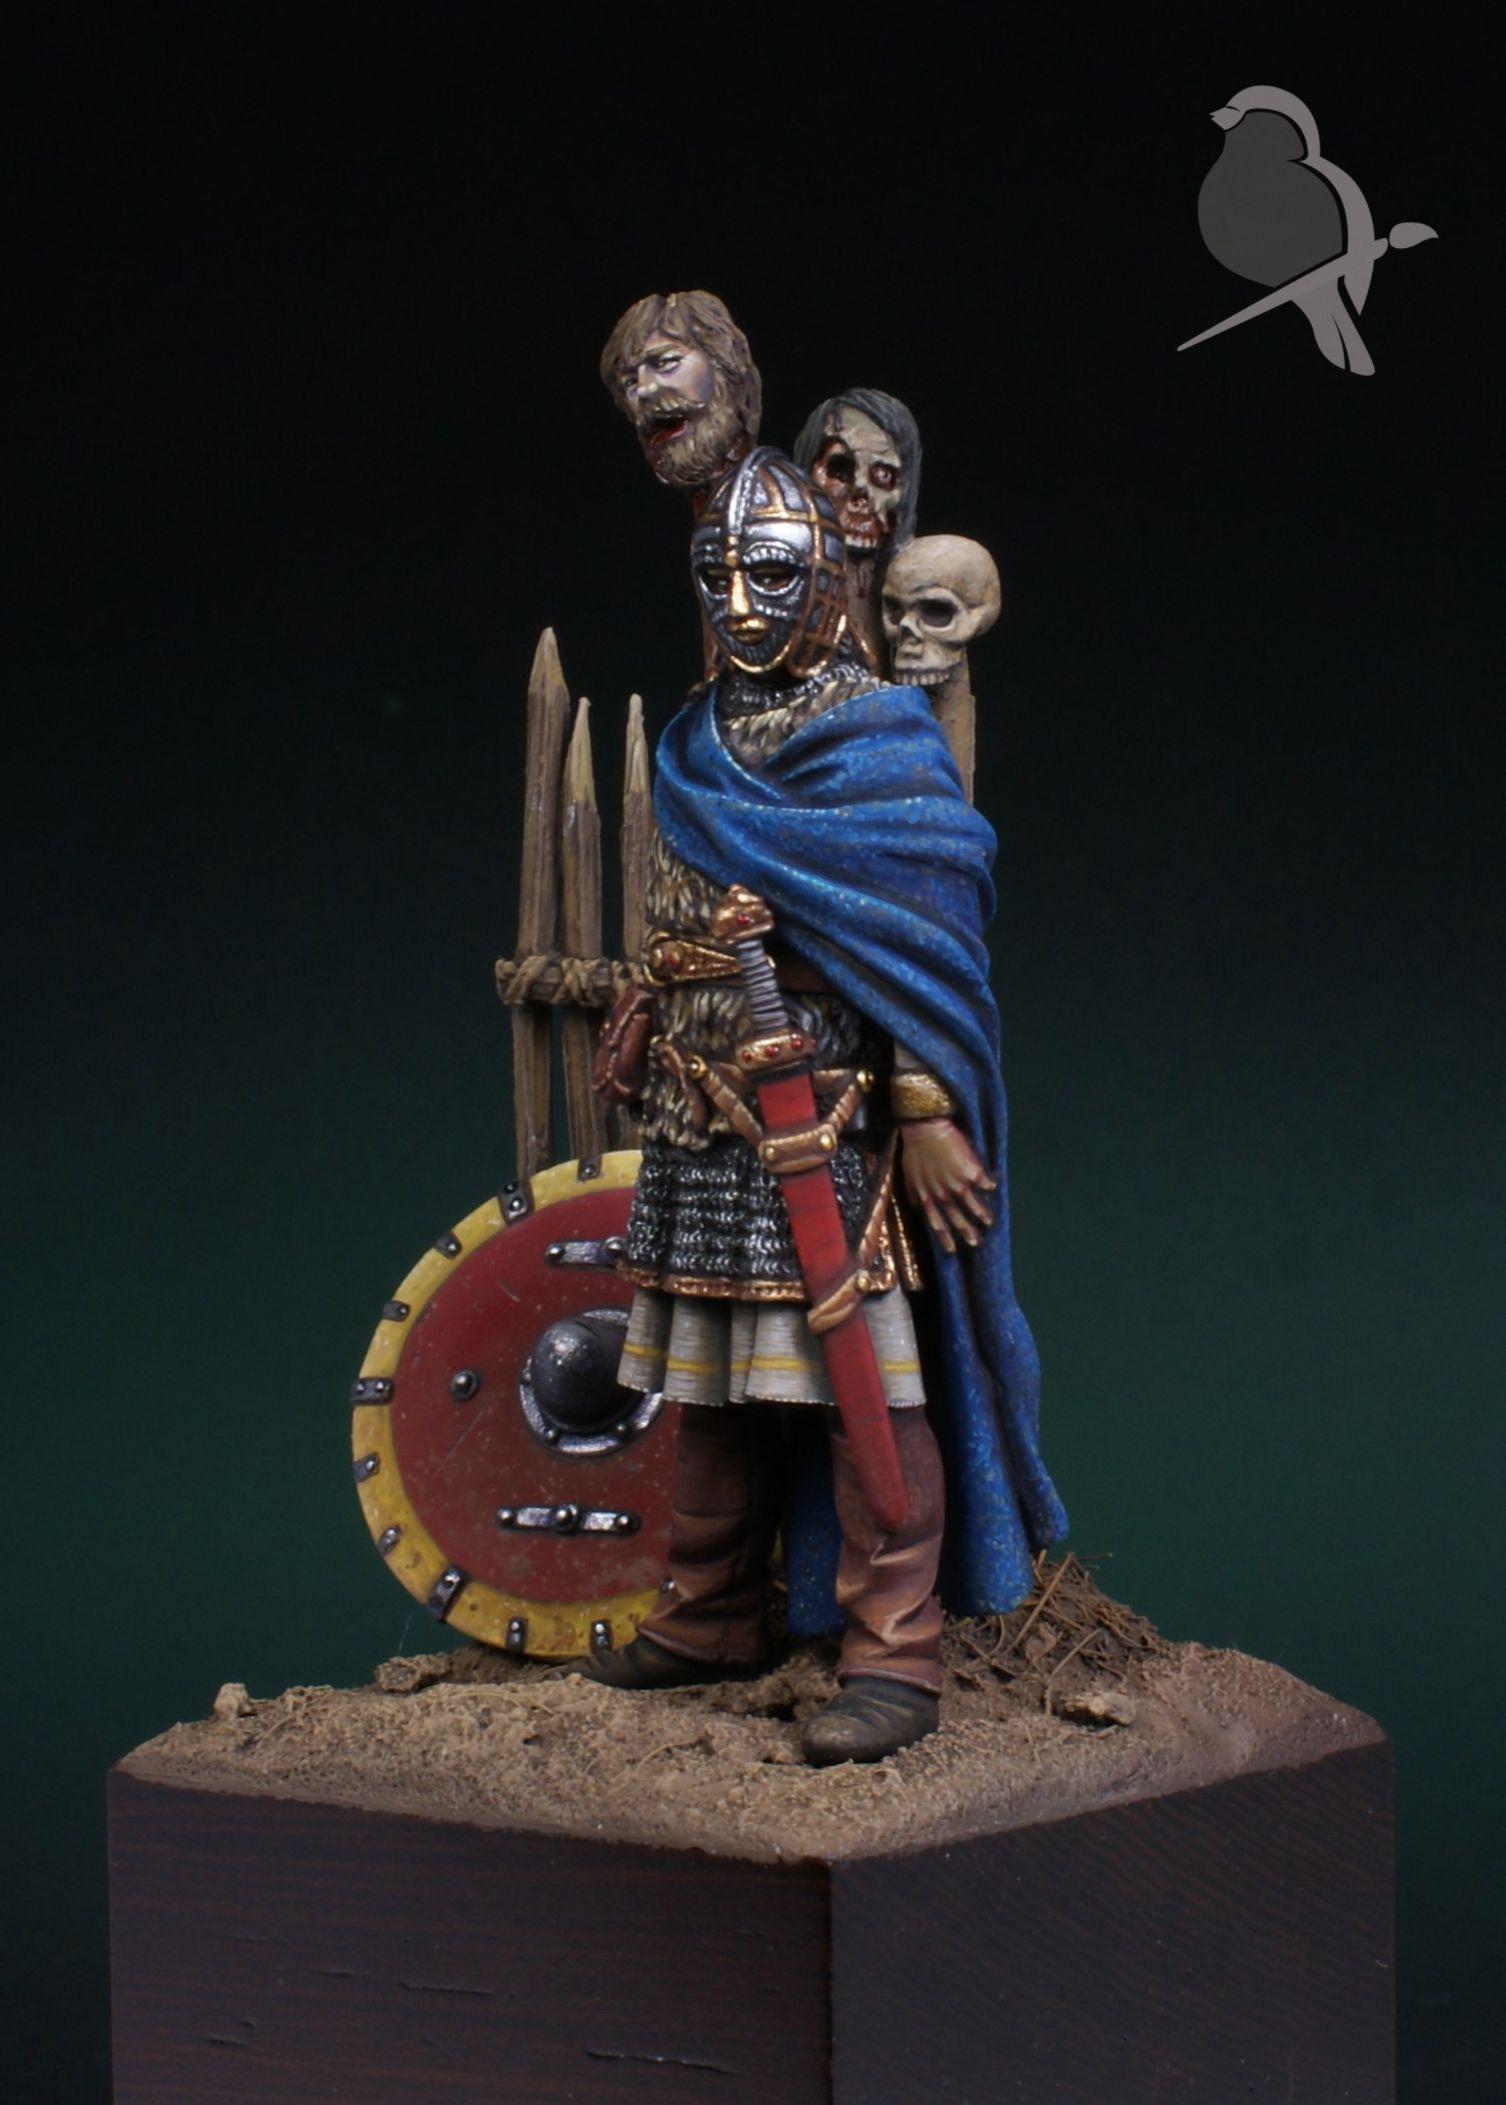 Figures: Saxon warlord, photo #2